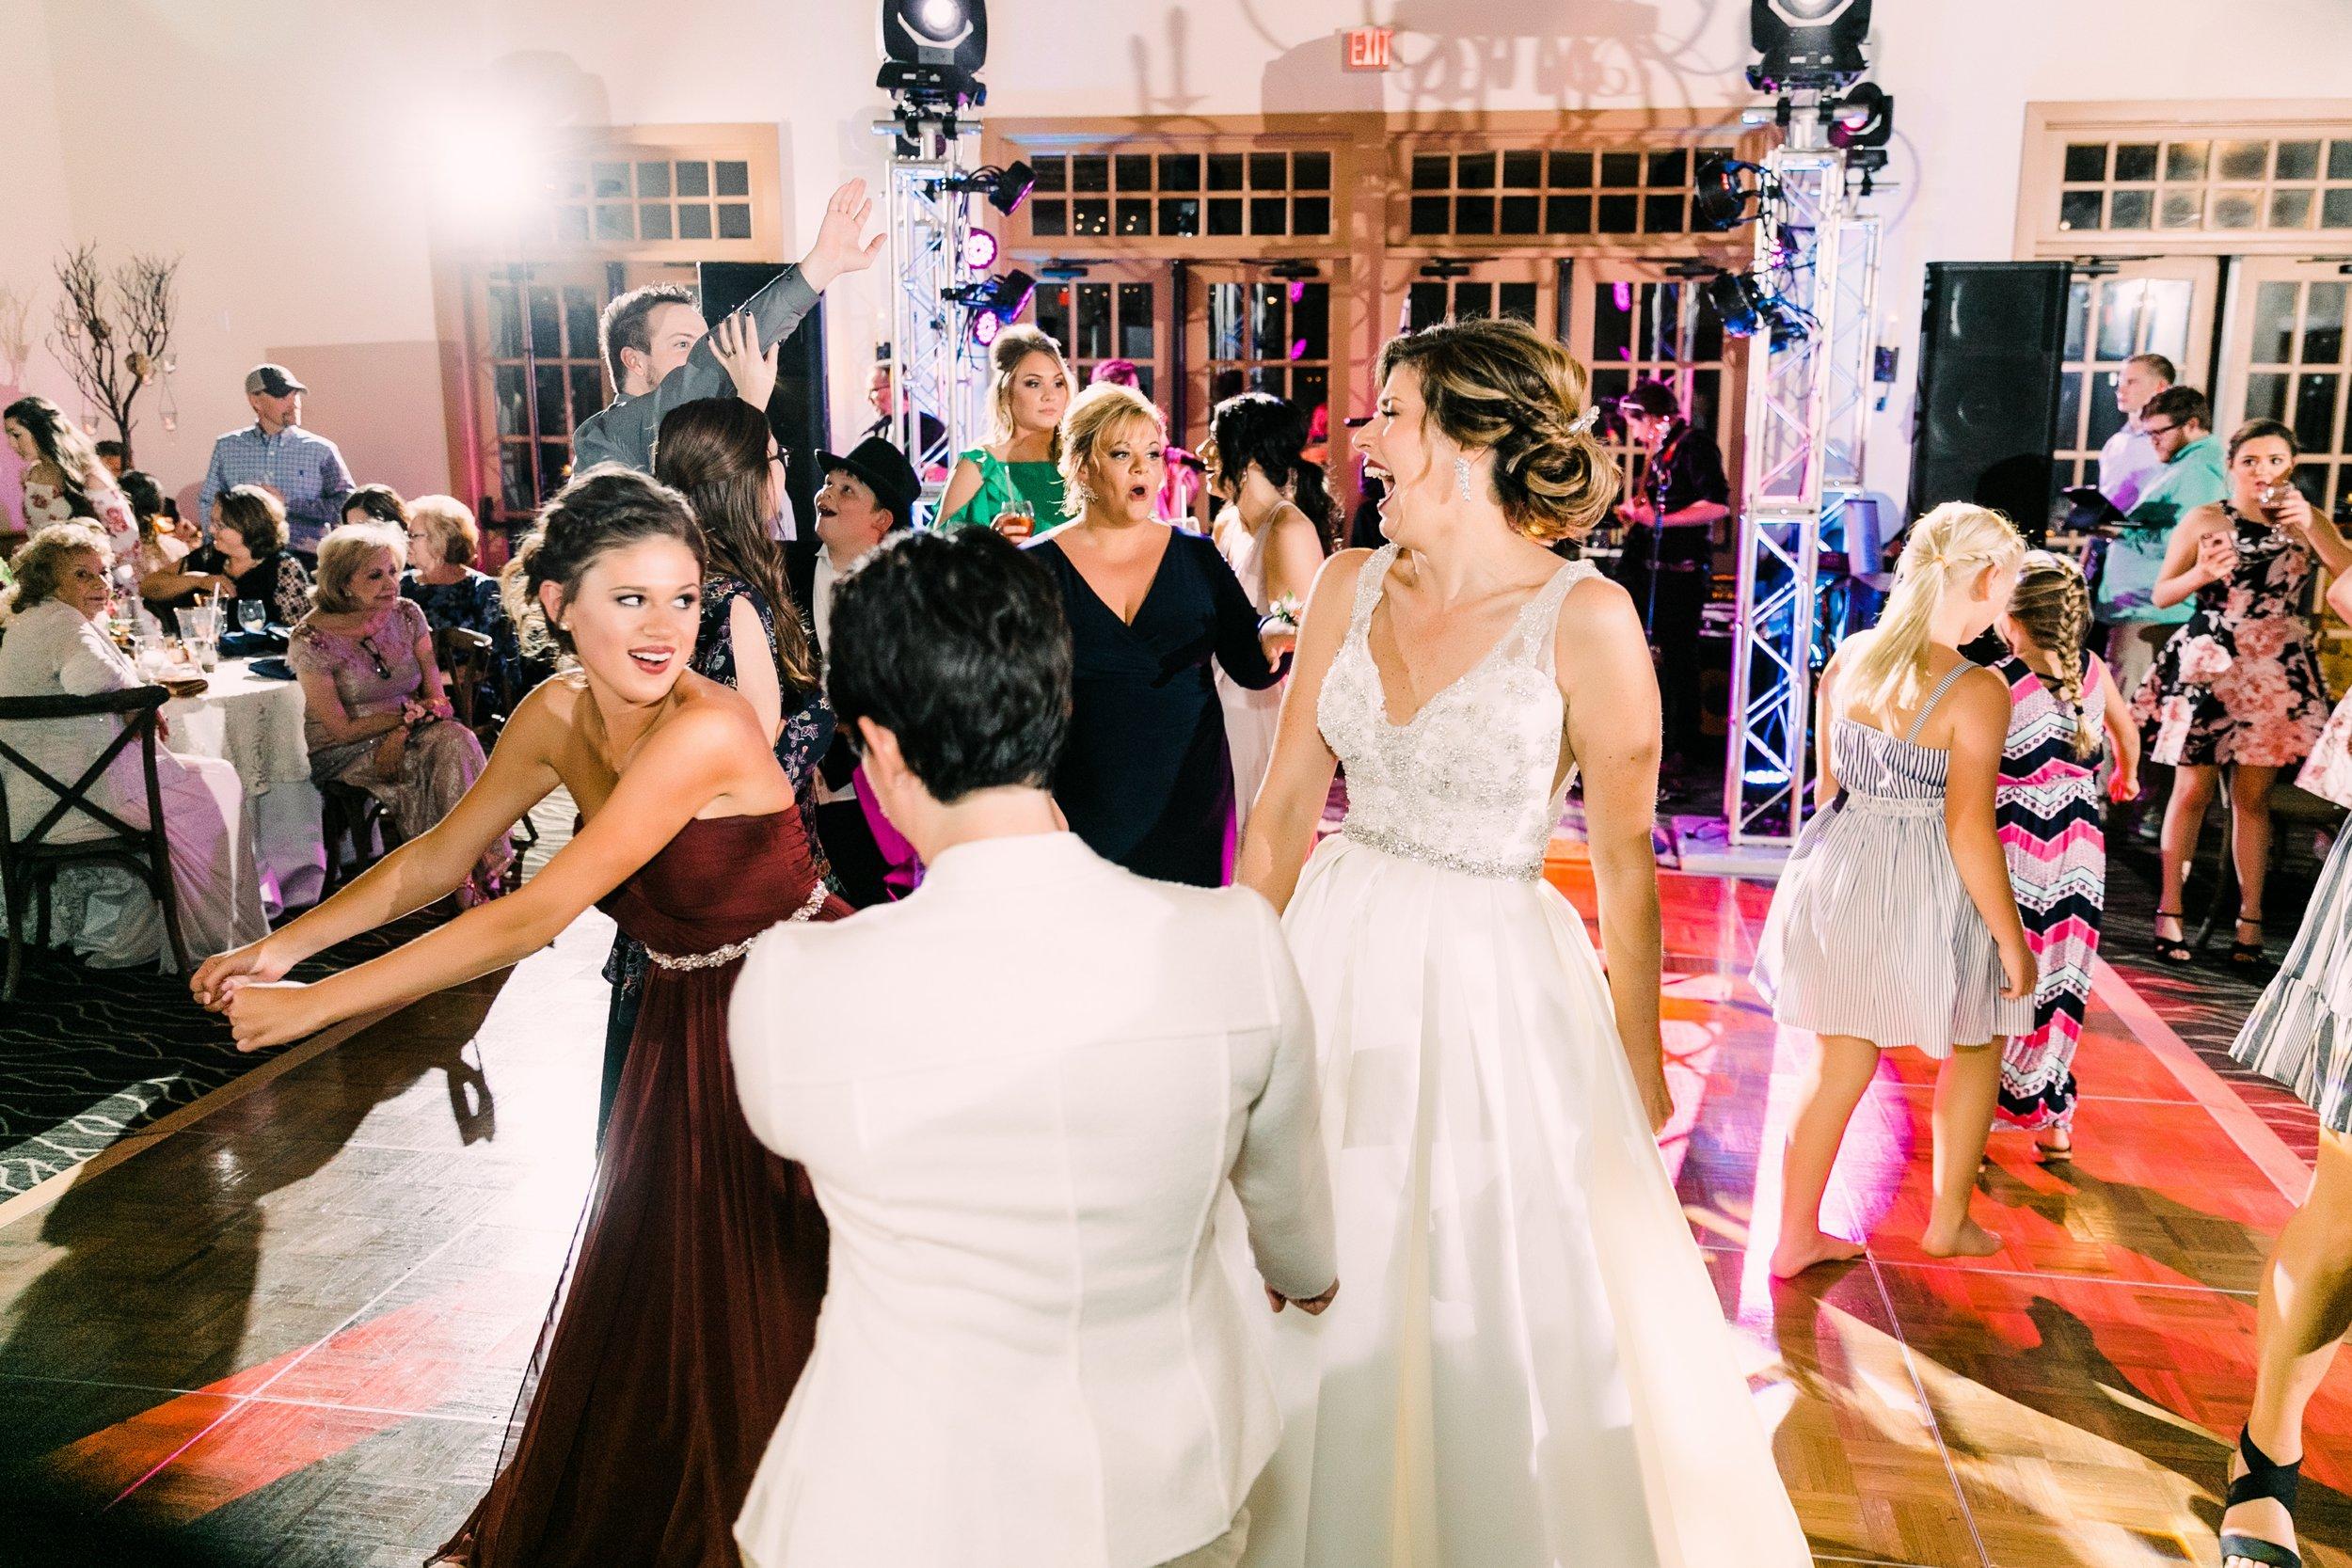 haehn-wedding-little-chapel-in-the-woods-denton-tx-lantana-golf-club-wedding-060.jpg